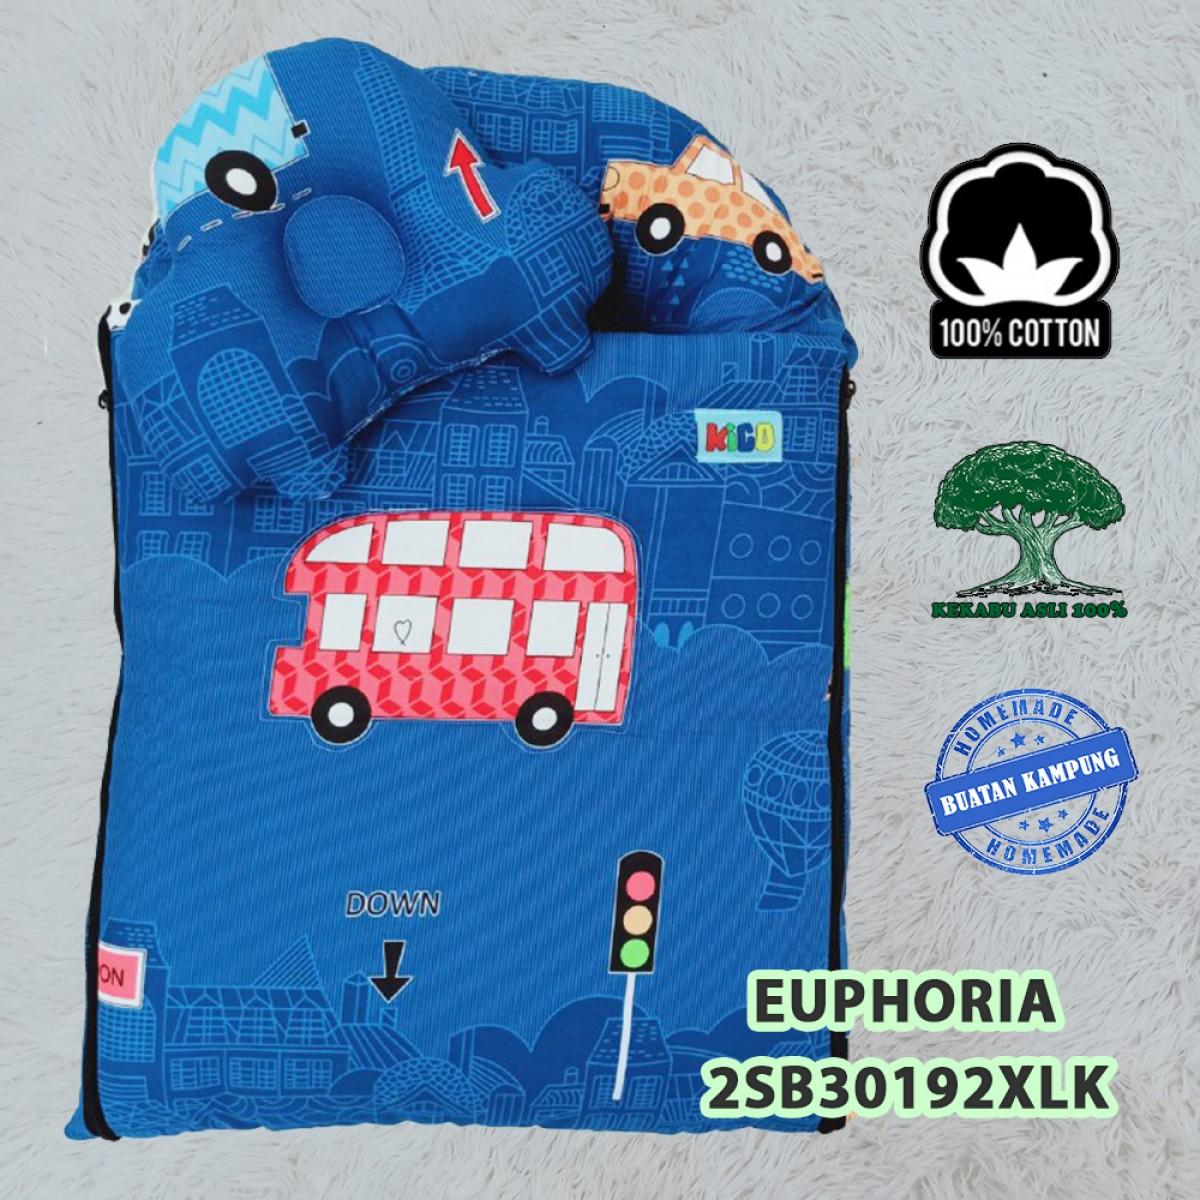 Euphoria - Kico Baby Center